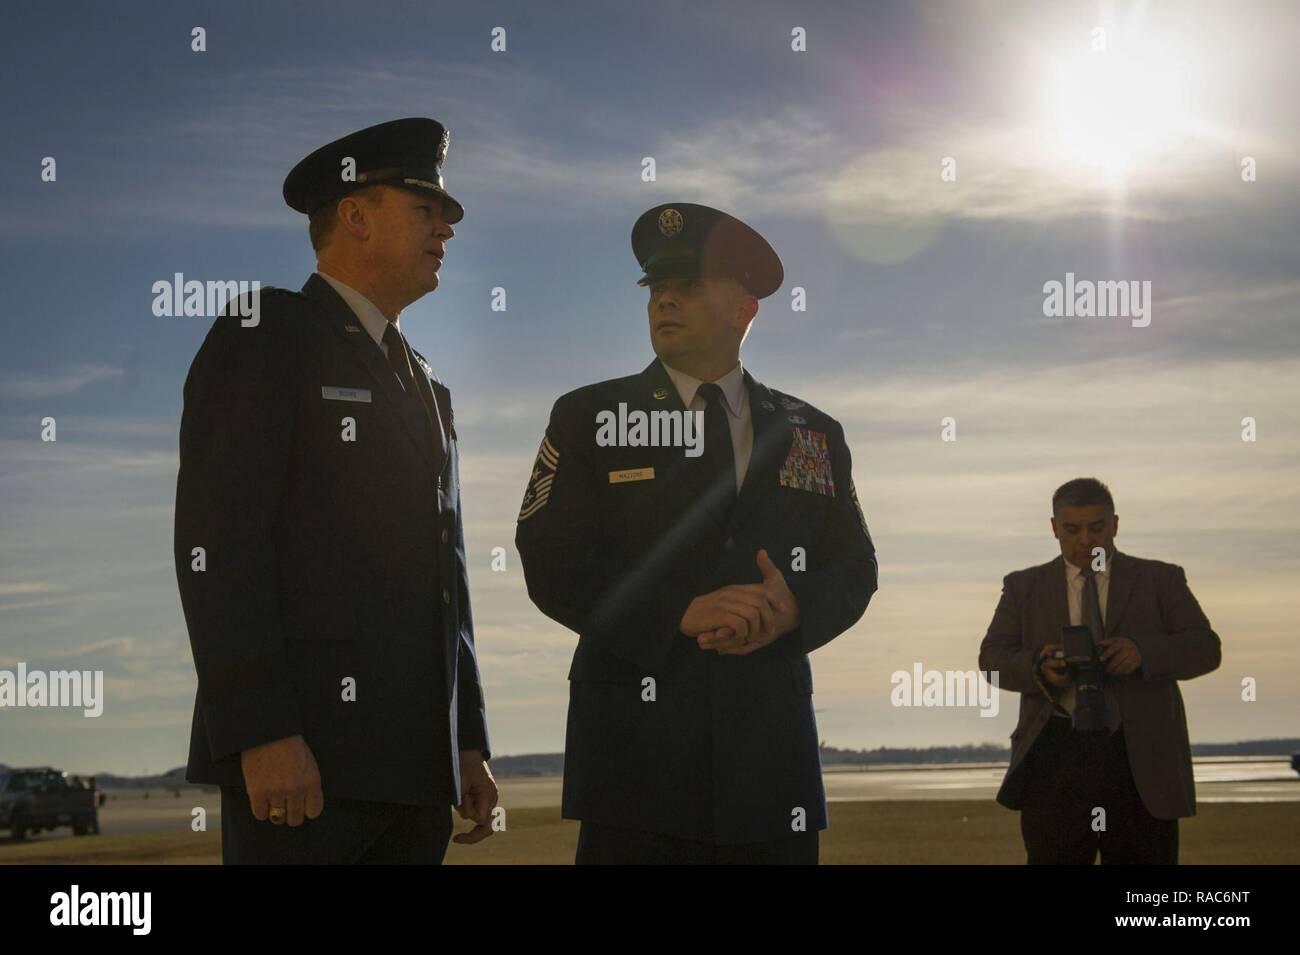 b6fe6ce27 Air Force District of Washington Commander Maj. Gen. Darryl Burke and AFDW  Command Chief